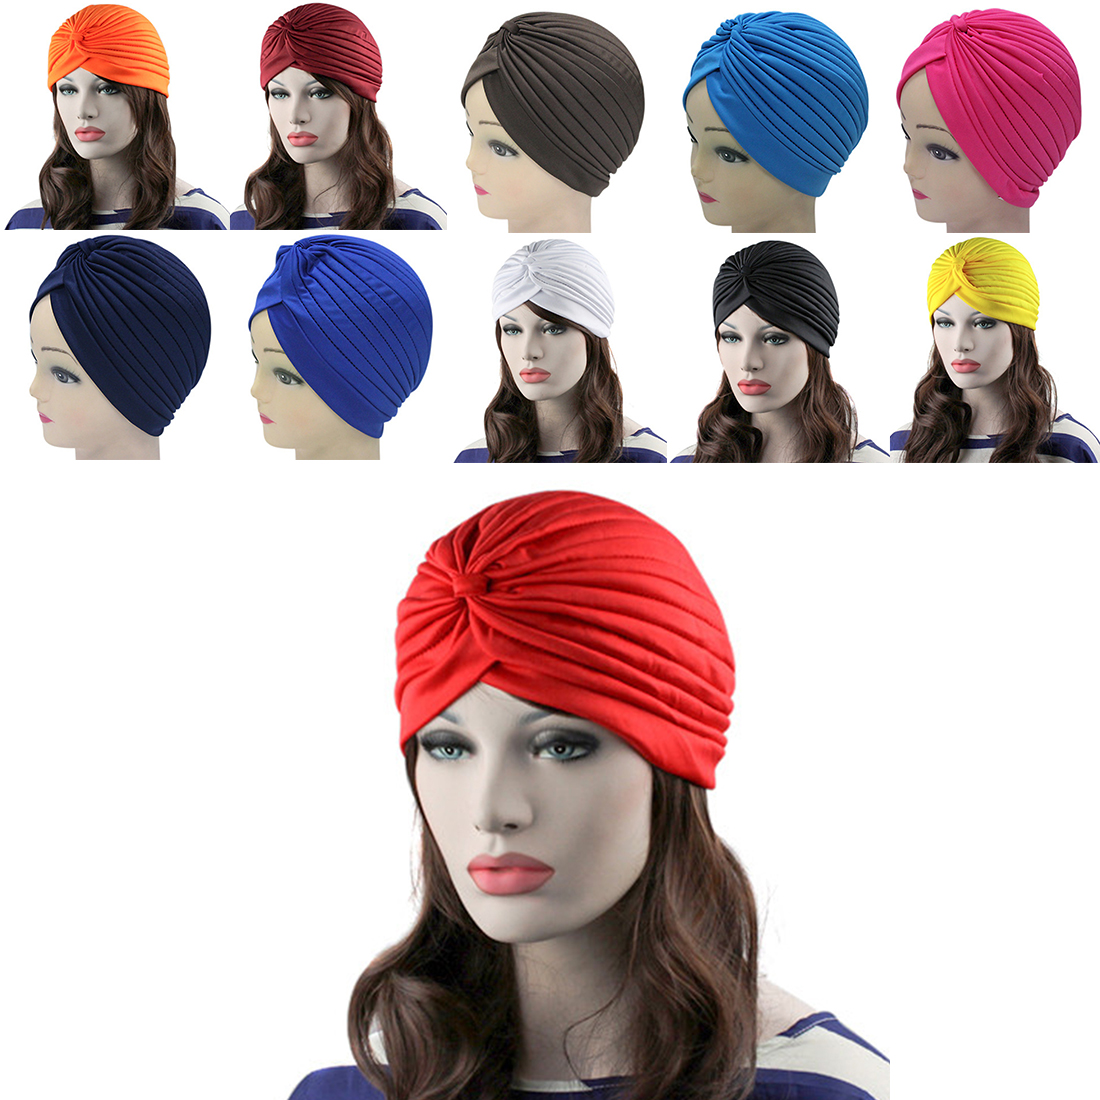 Unisex Indian Style Fashion Stretchable Turban Hat Hair Head Wrap Cap Headdress skullies 2017 fashion new arrival indian yoga turban hat ear cap sleeve head cap hat men and women multicolor fold 1866688